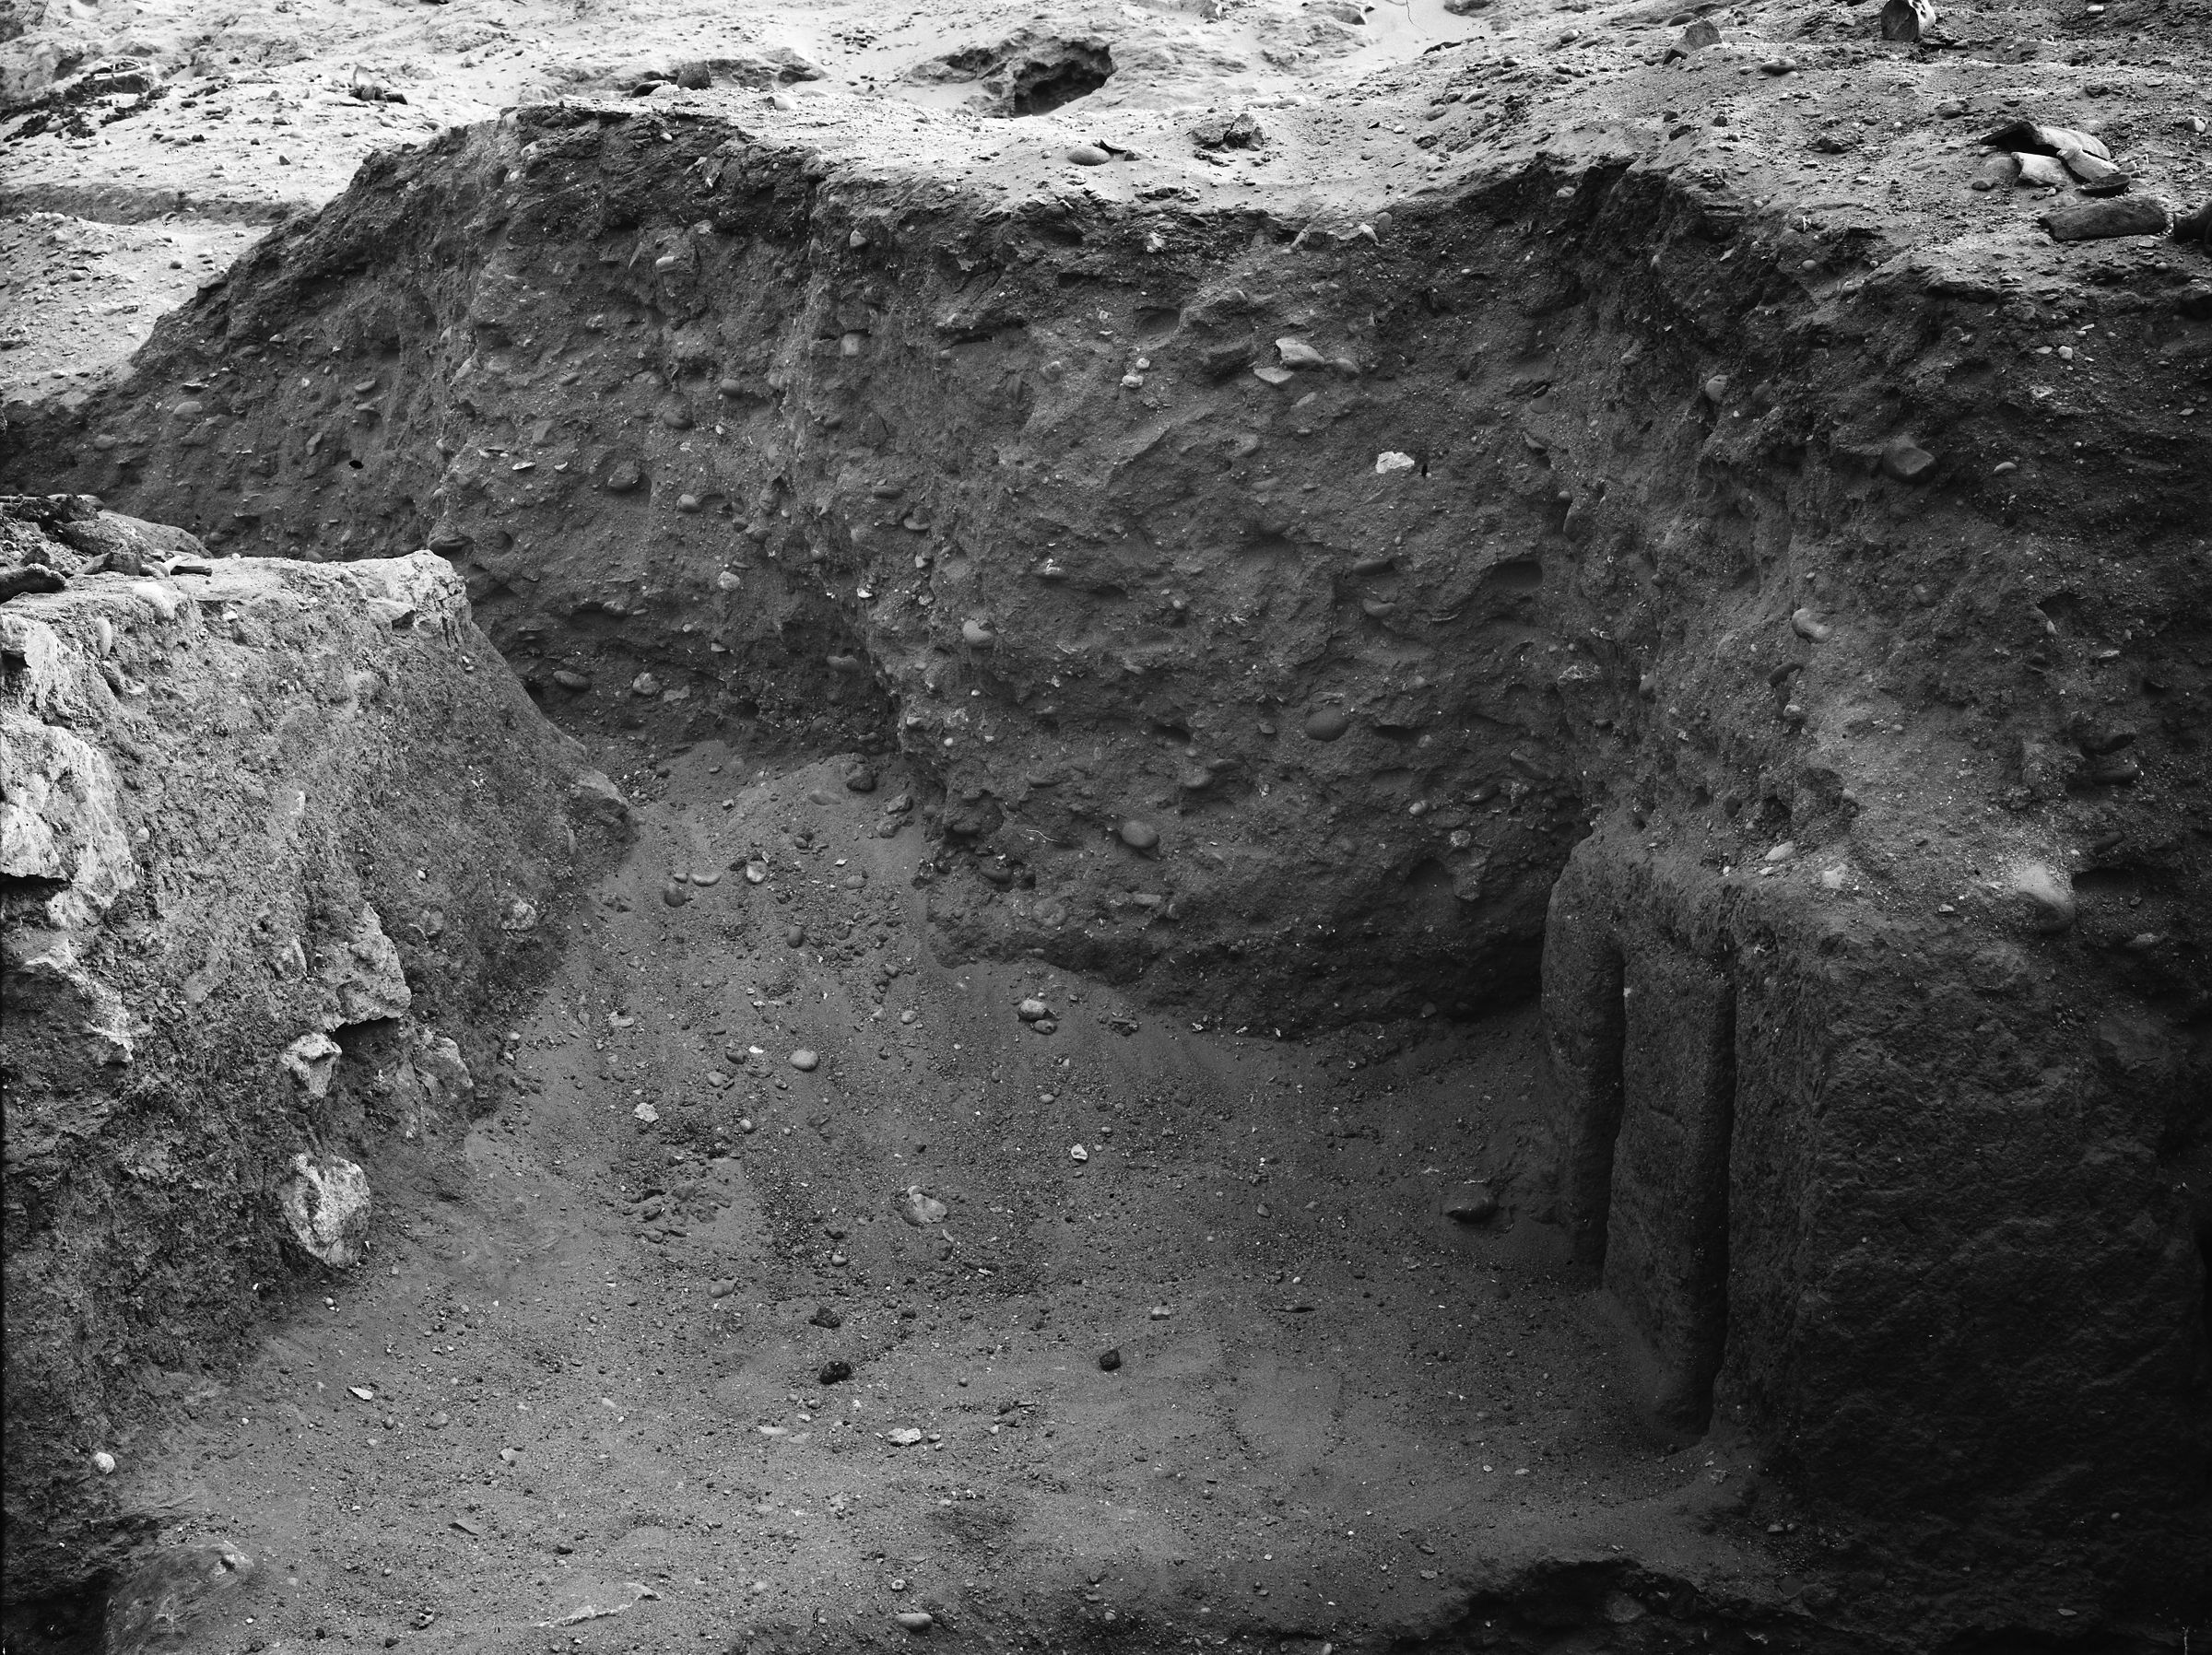 Wadi Cemetery (Reisner; north of W. Cem): Site: Giza; View: GW 63, GW 75